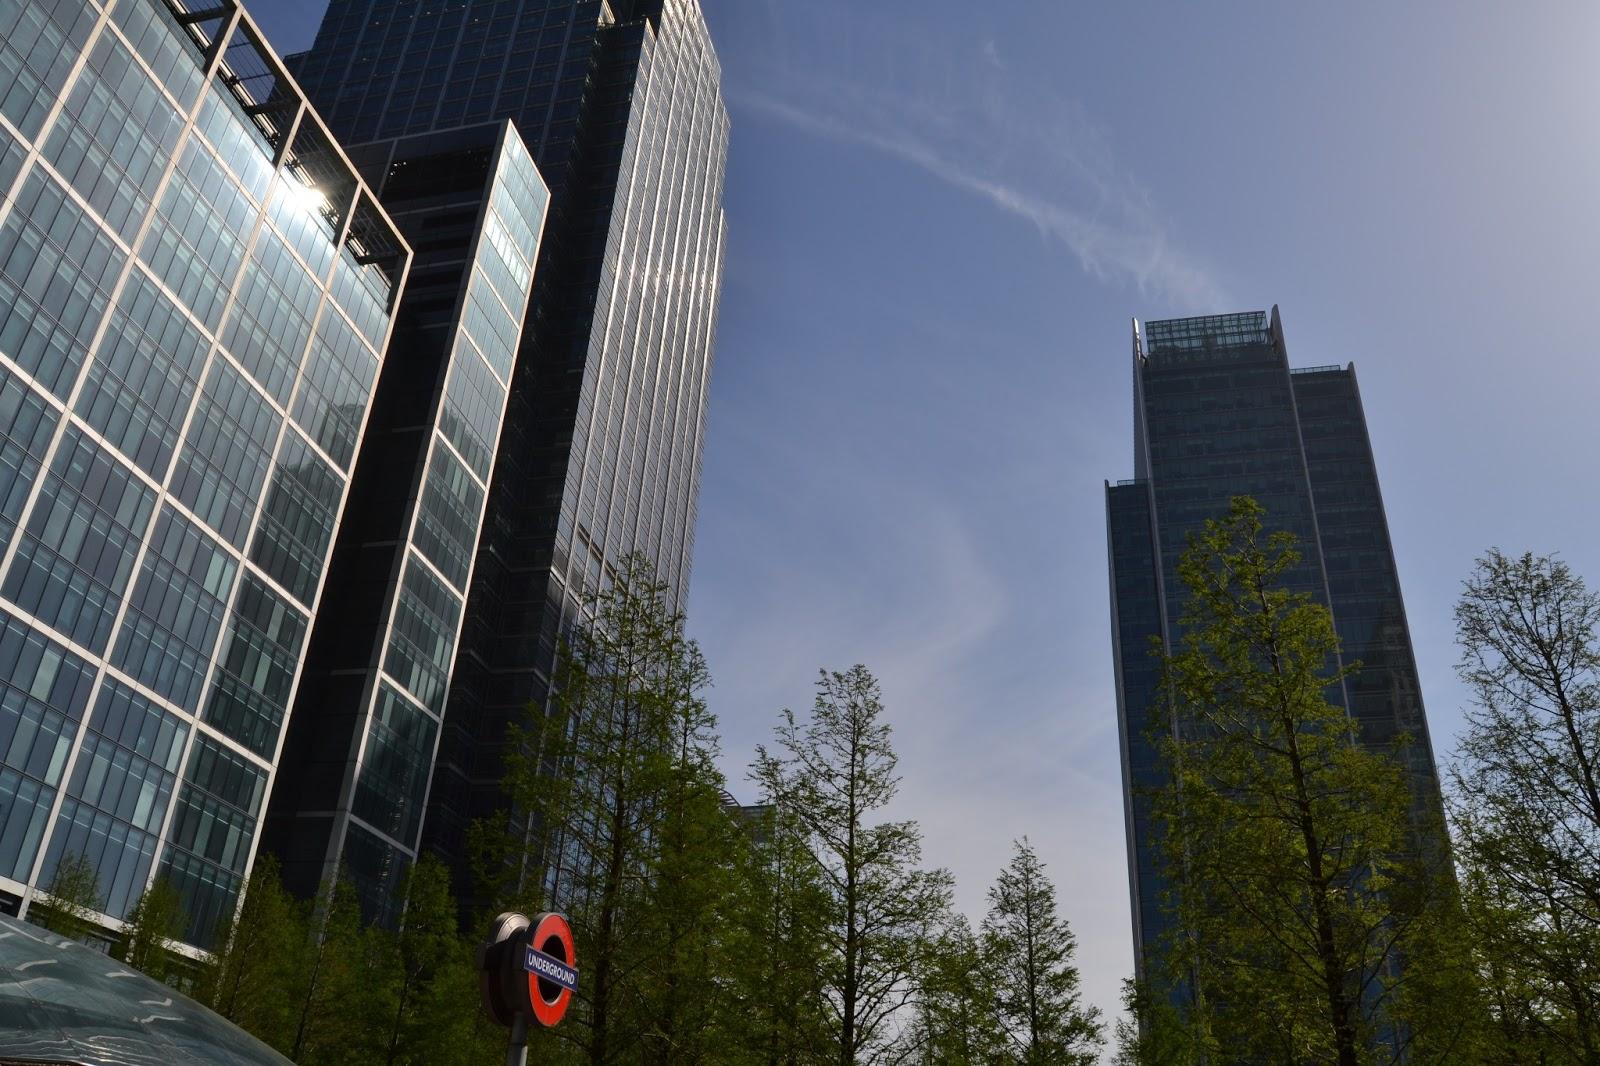 Orbit londinese comprare casa a londra parte prima for Acquistare casa a londra